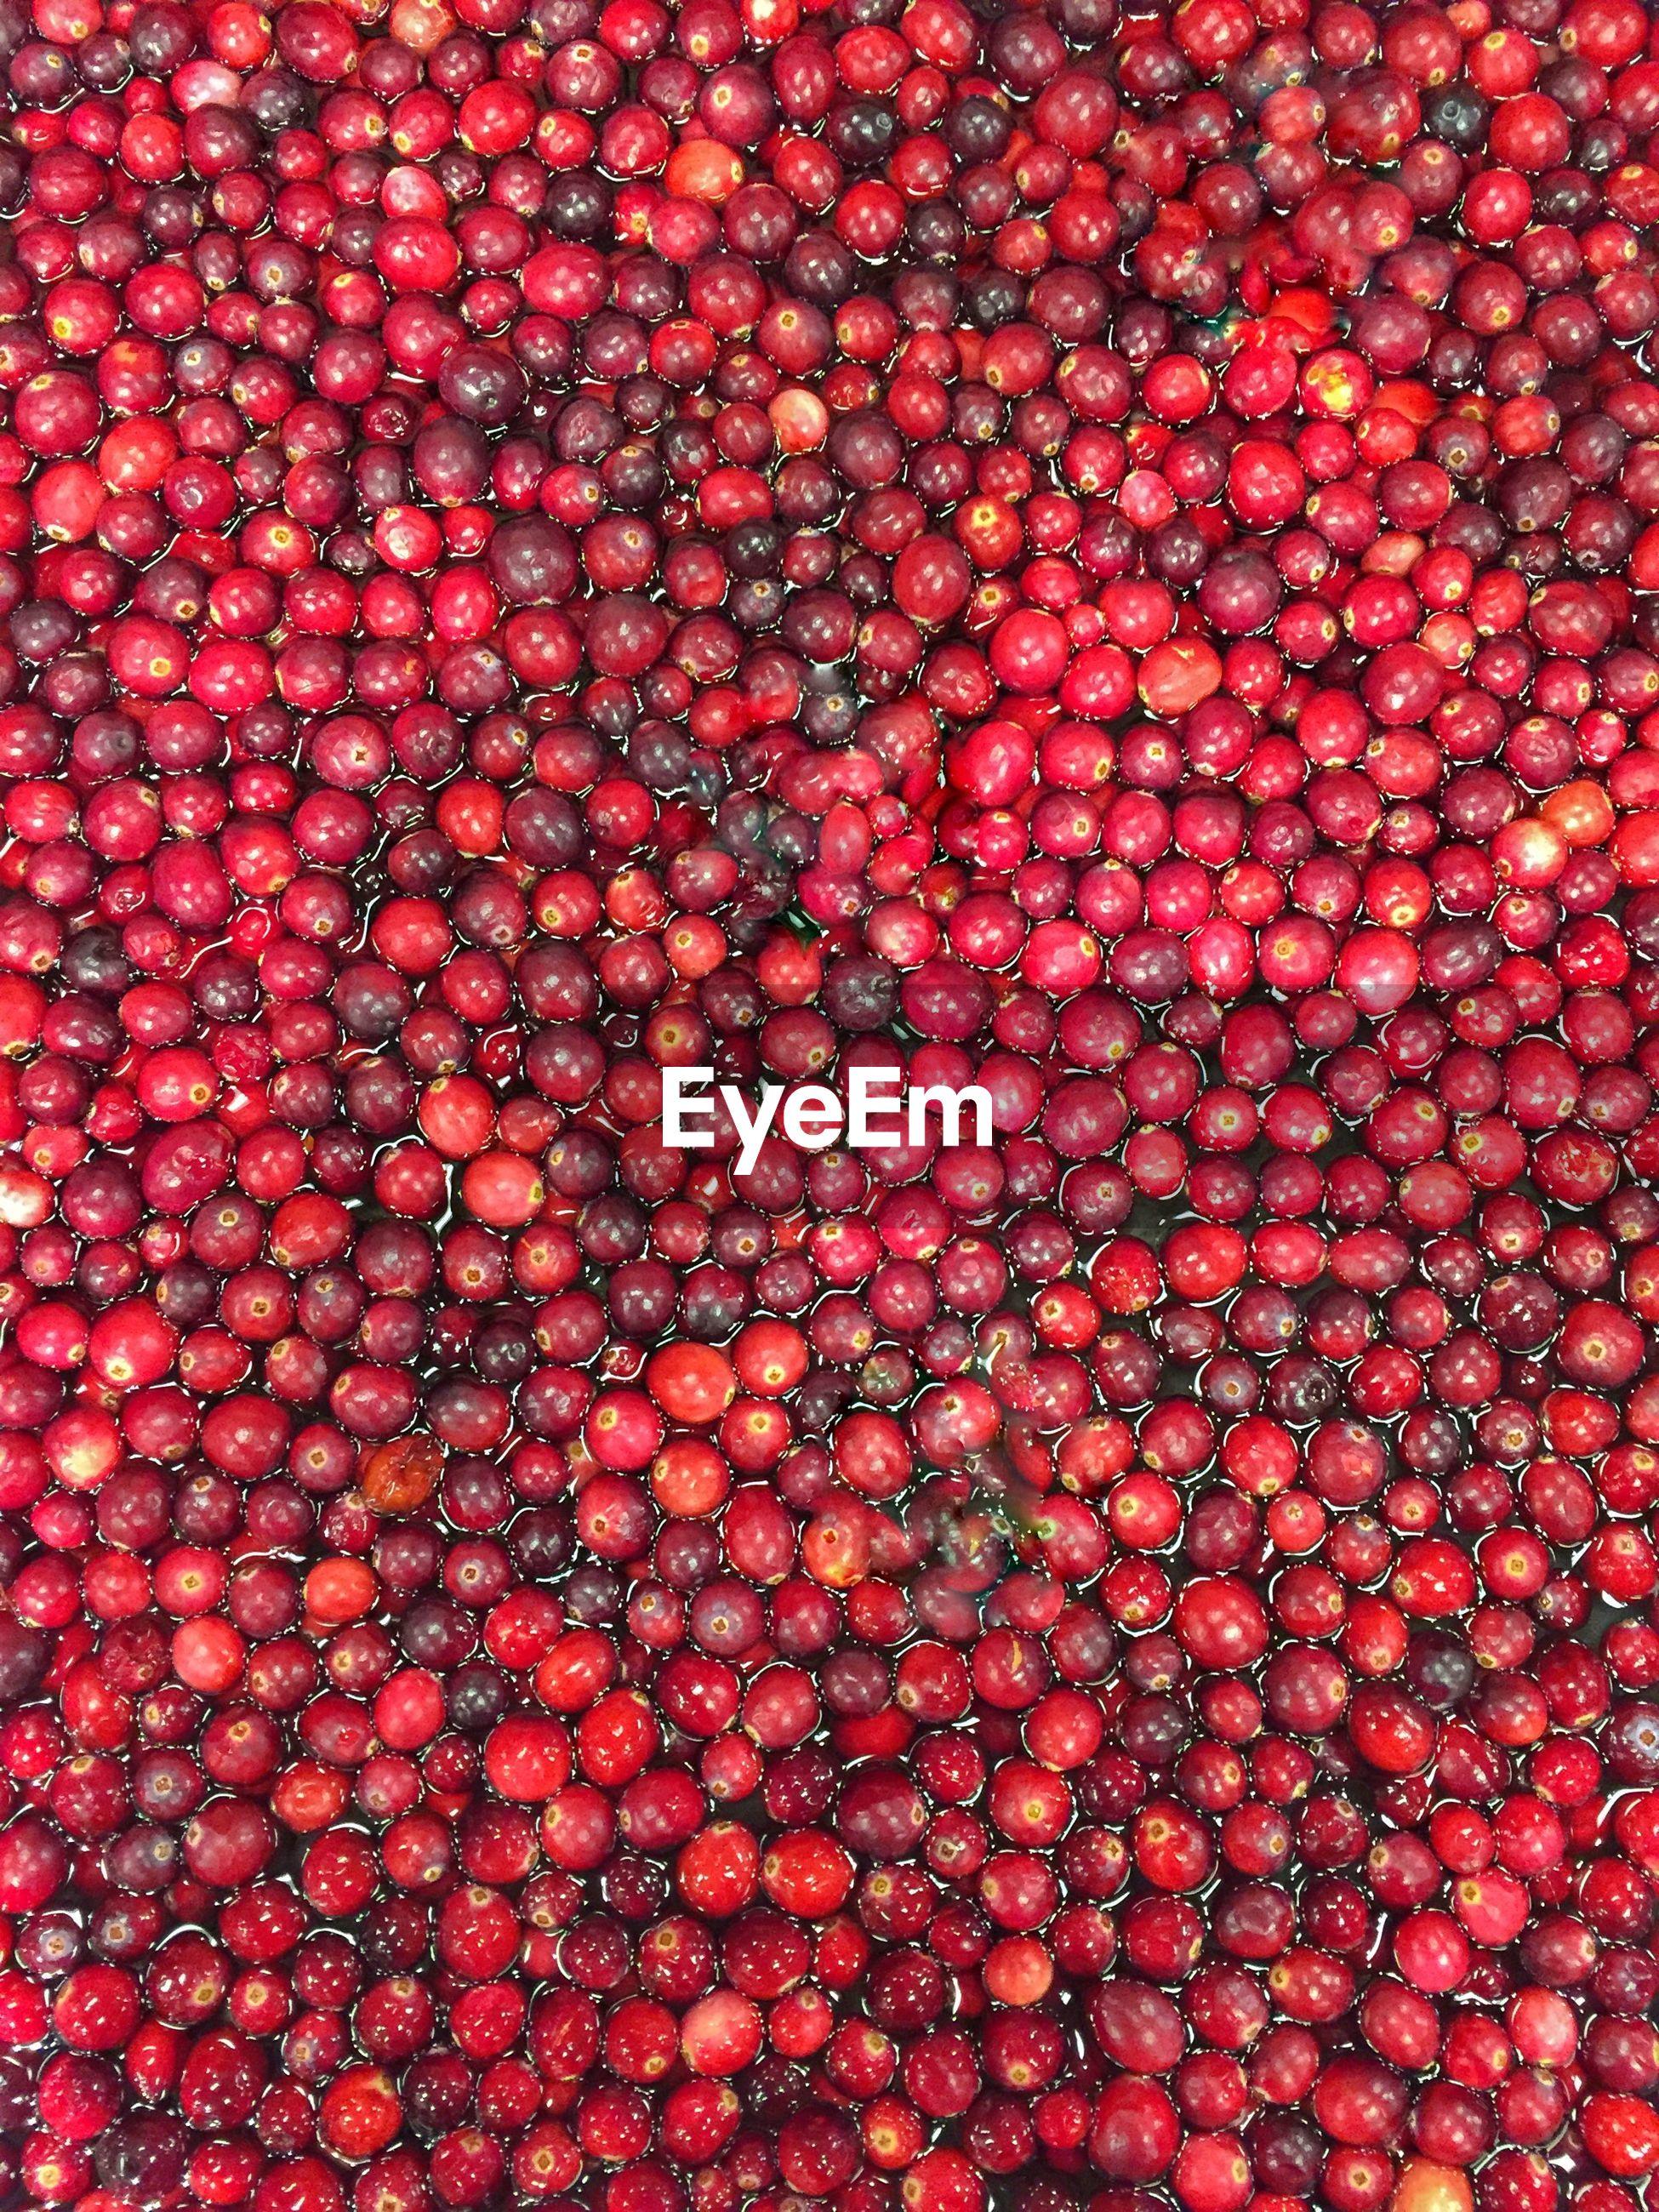 Full frame shot of red berries in water